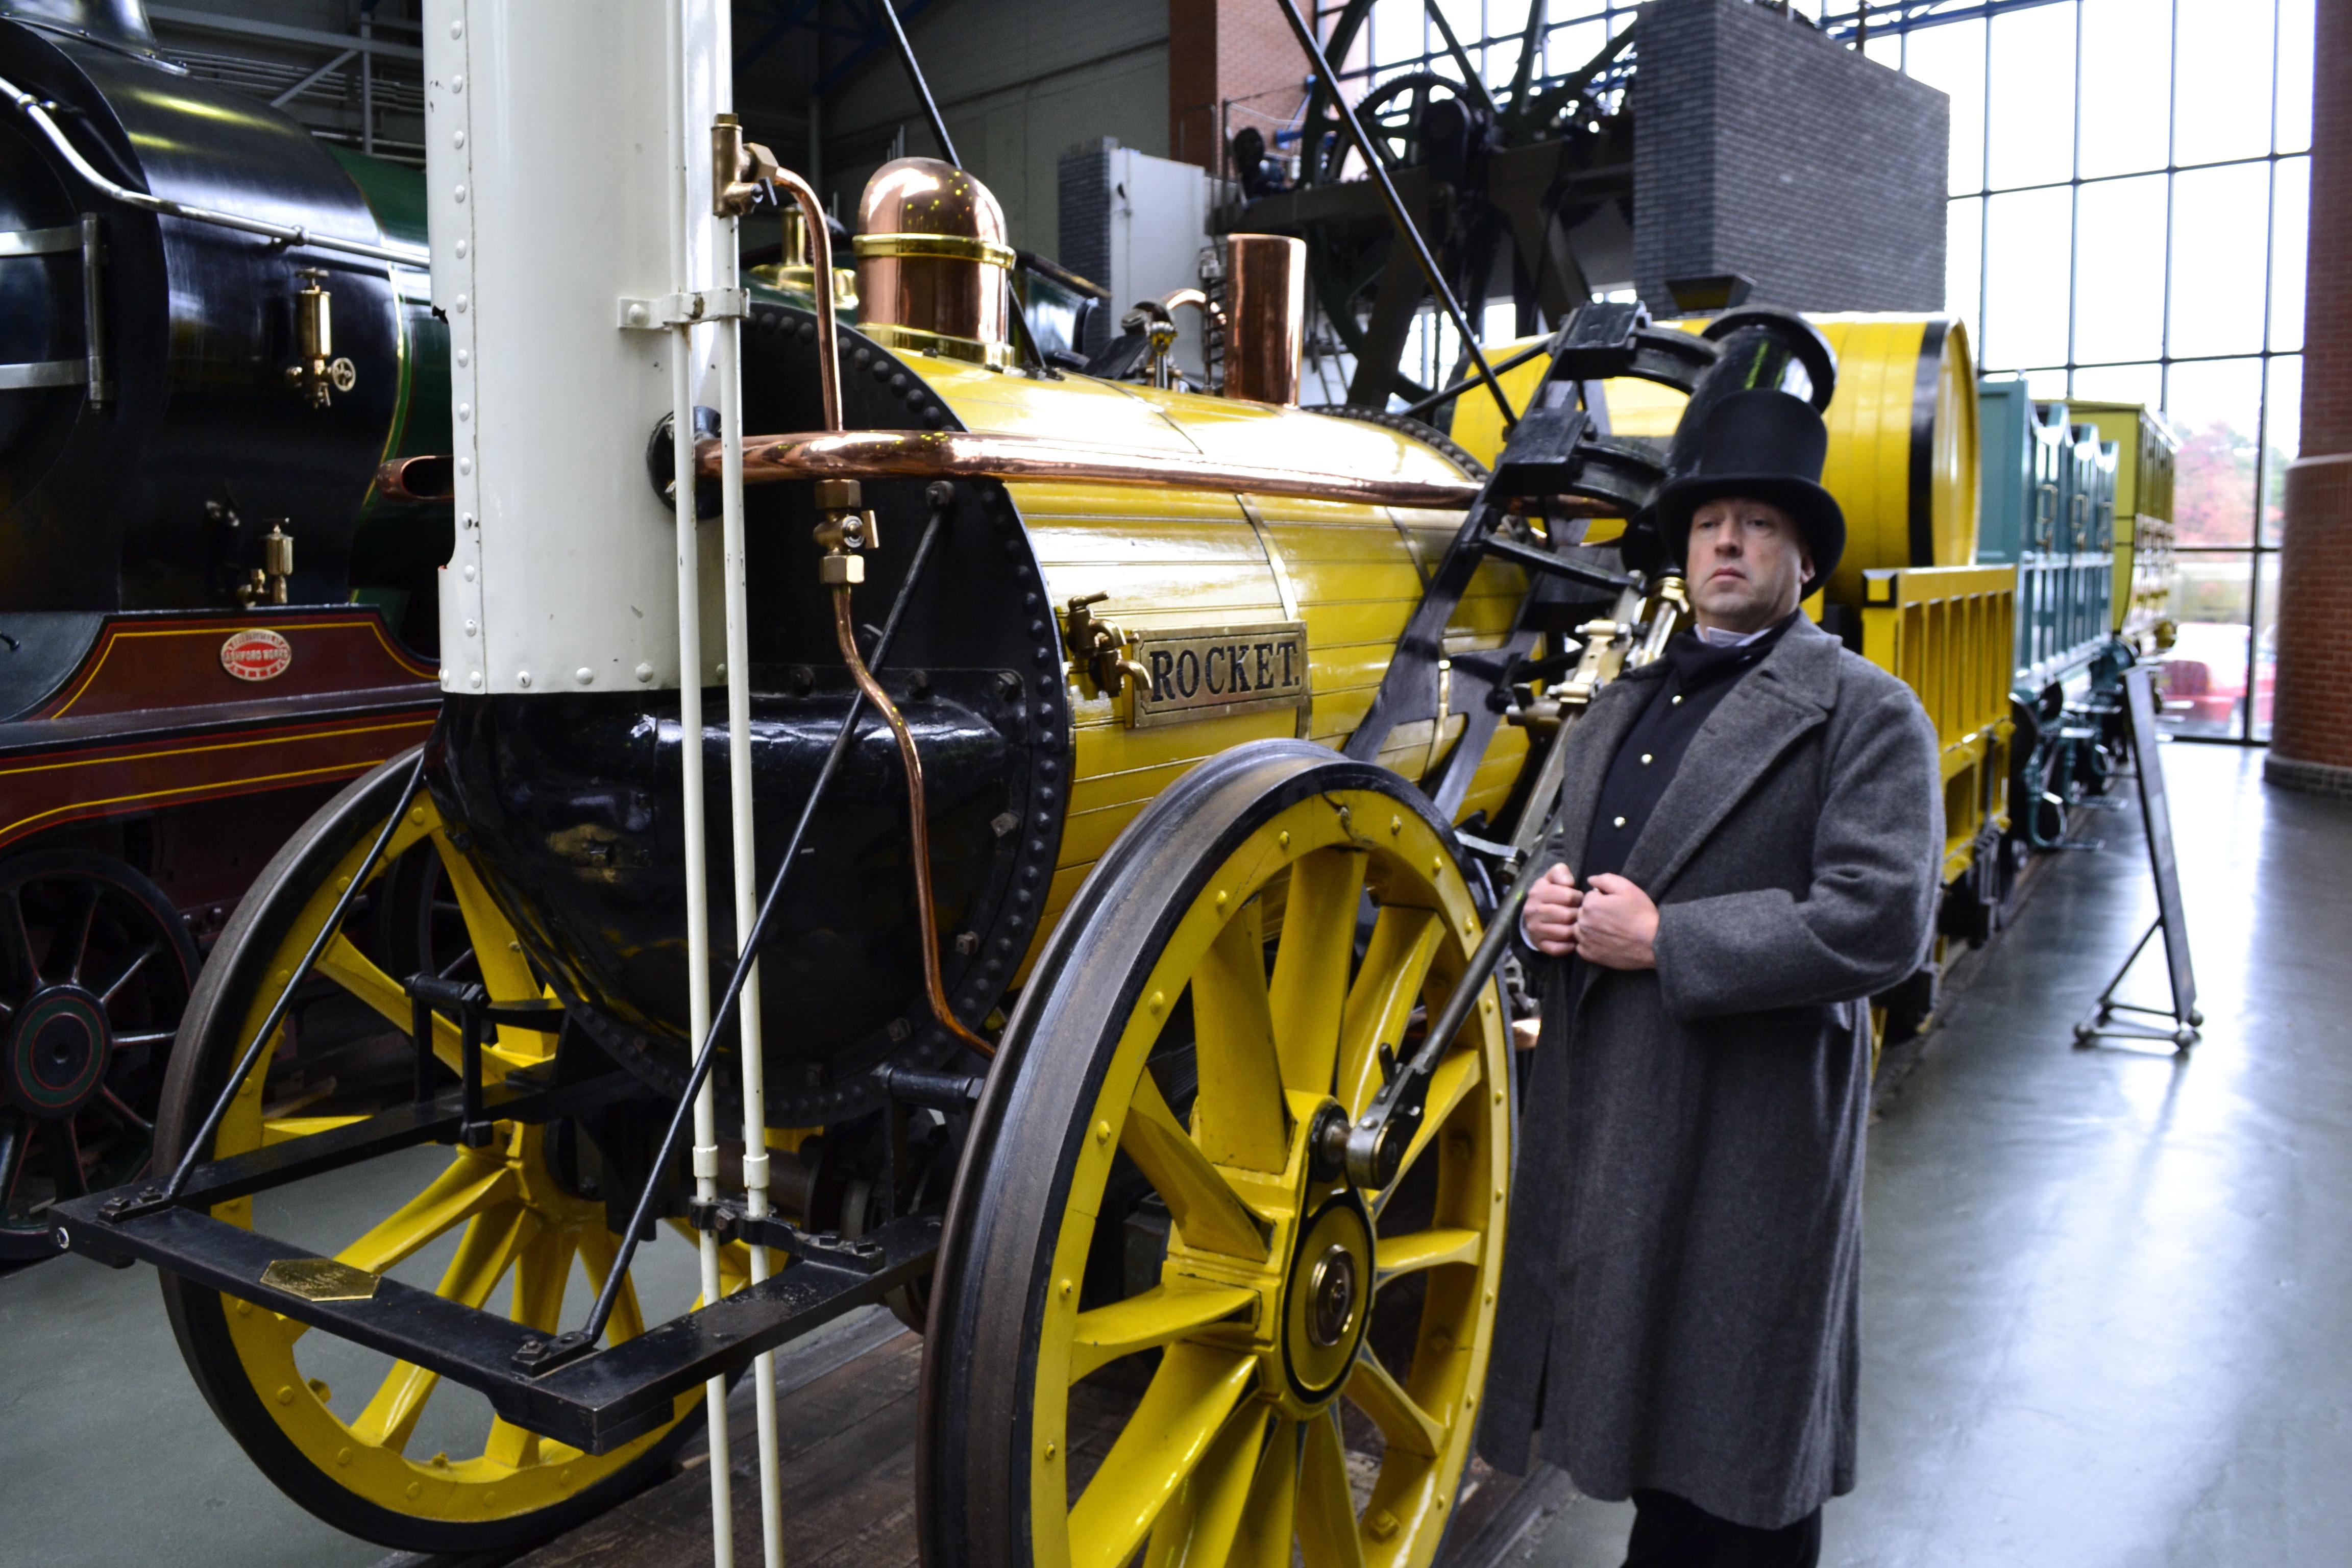 Robert Stephenson Humpus creator